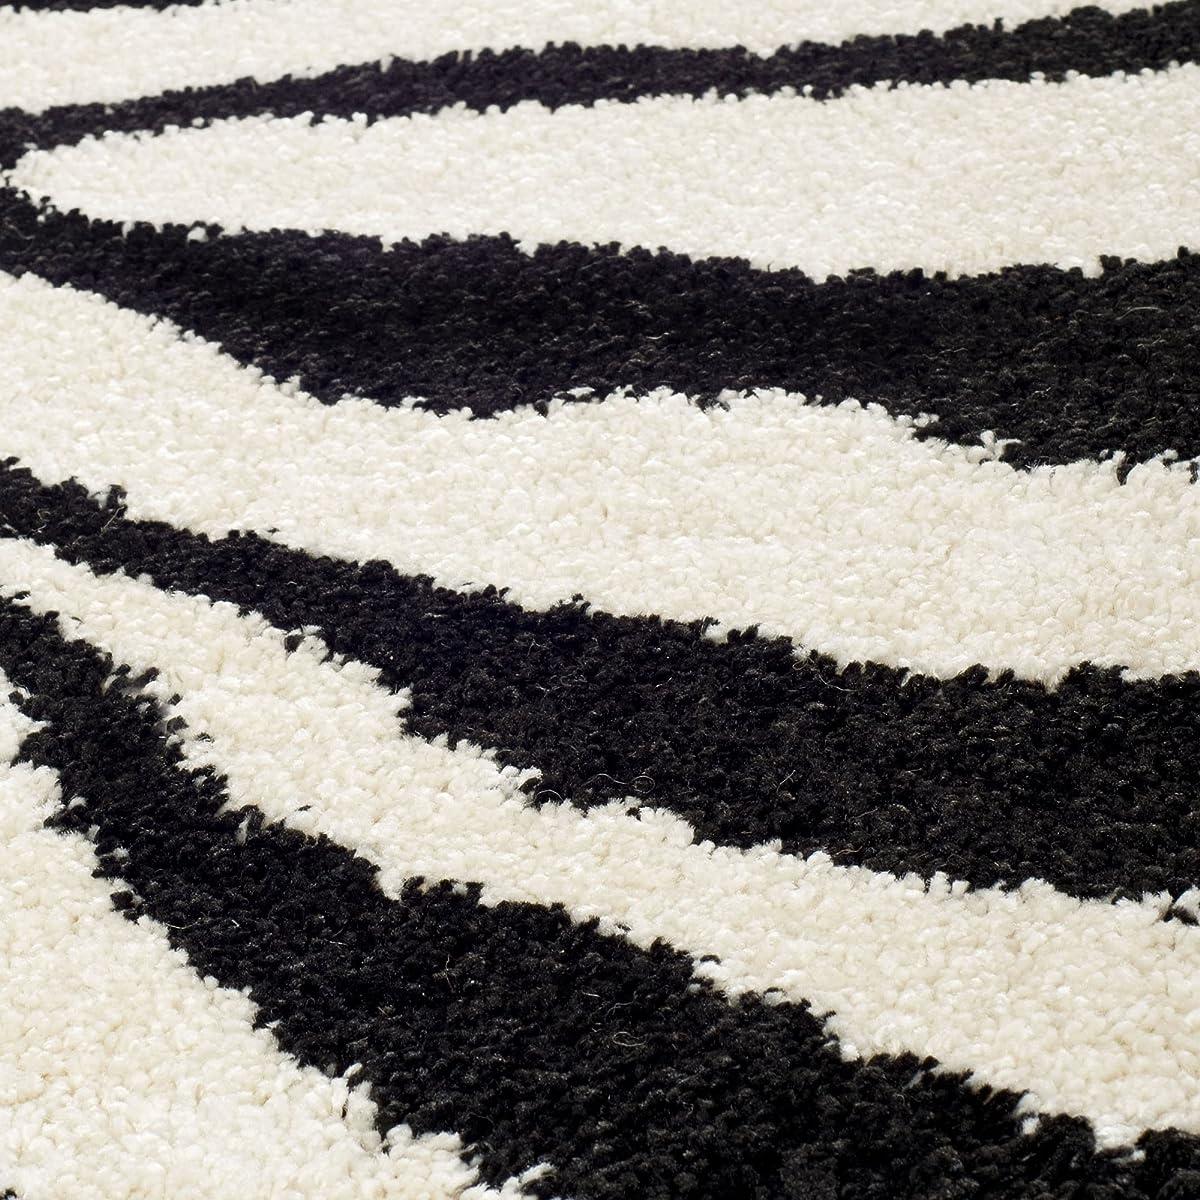 Safavieh Zebra Shag Collection SG452-1290 Ivory and Black Area Rug (4 x 6)